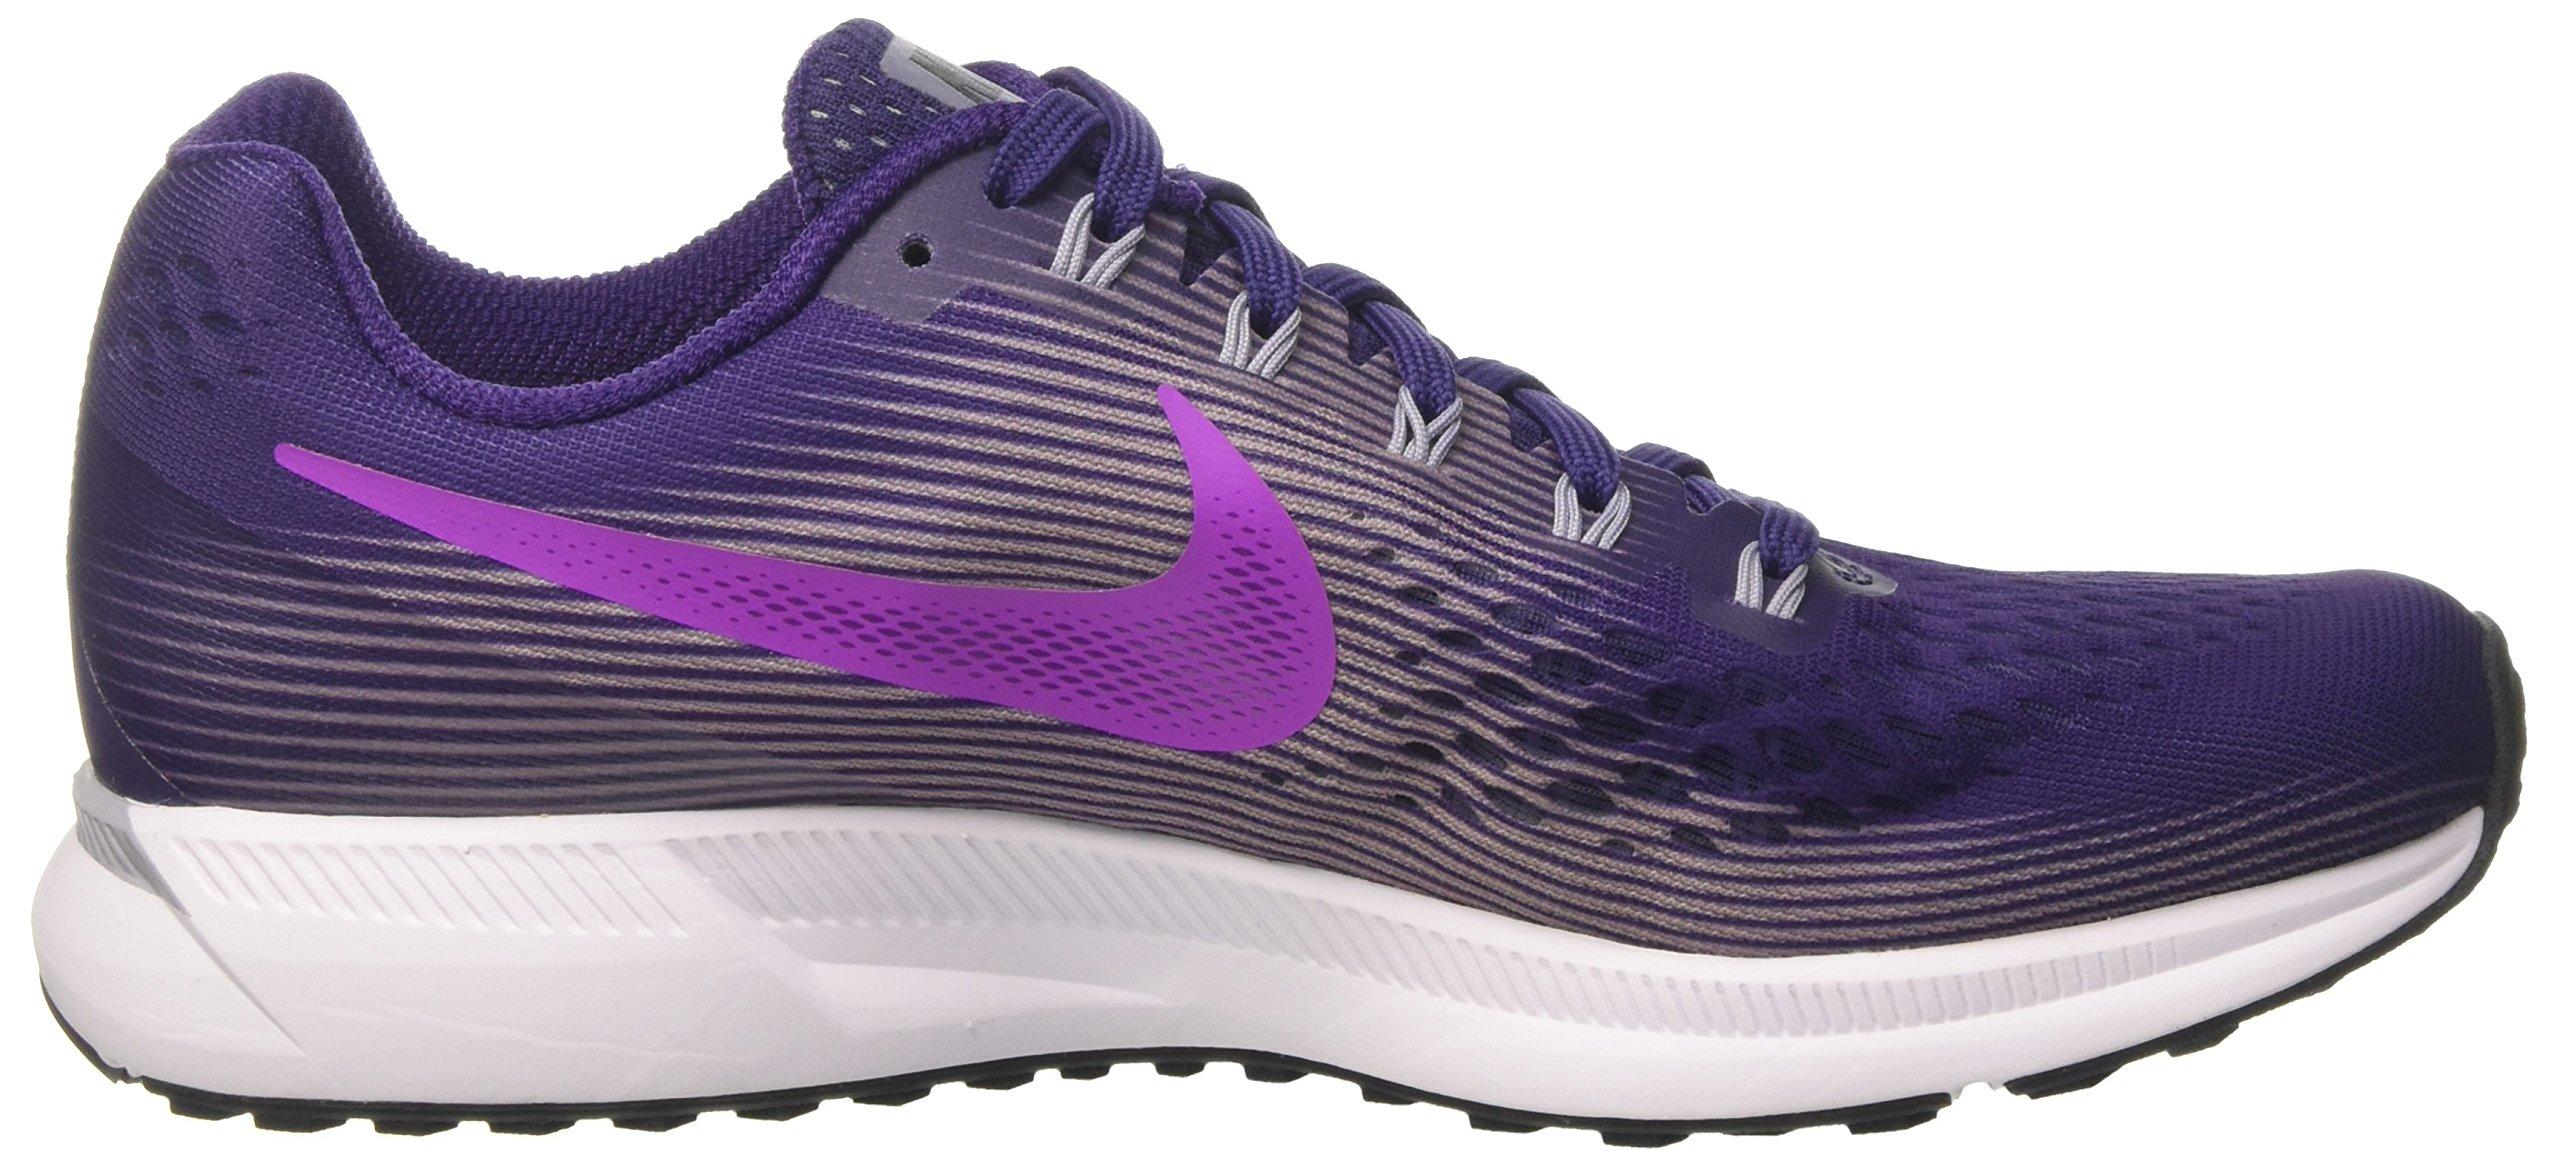 Nike Women's Air Zoom Pegasus 34 Running Shoes-Ink/Hyper Violet-6 by Nike (Image #6)